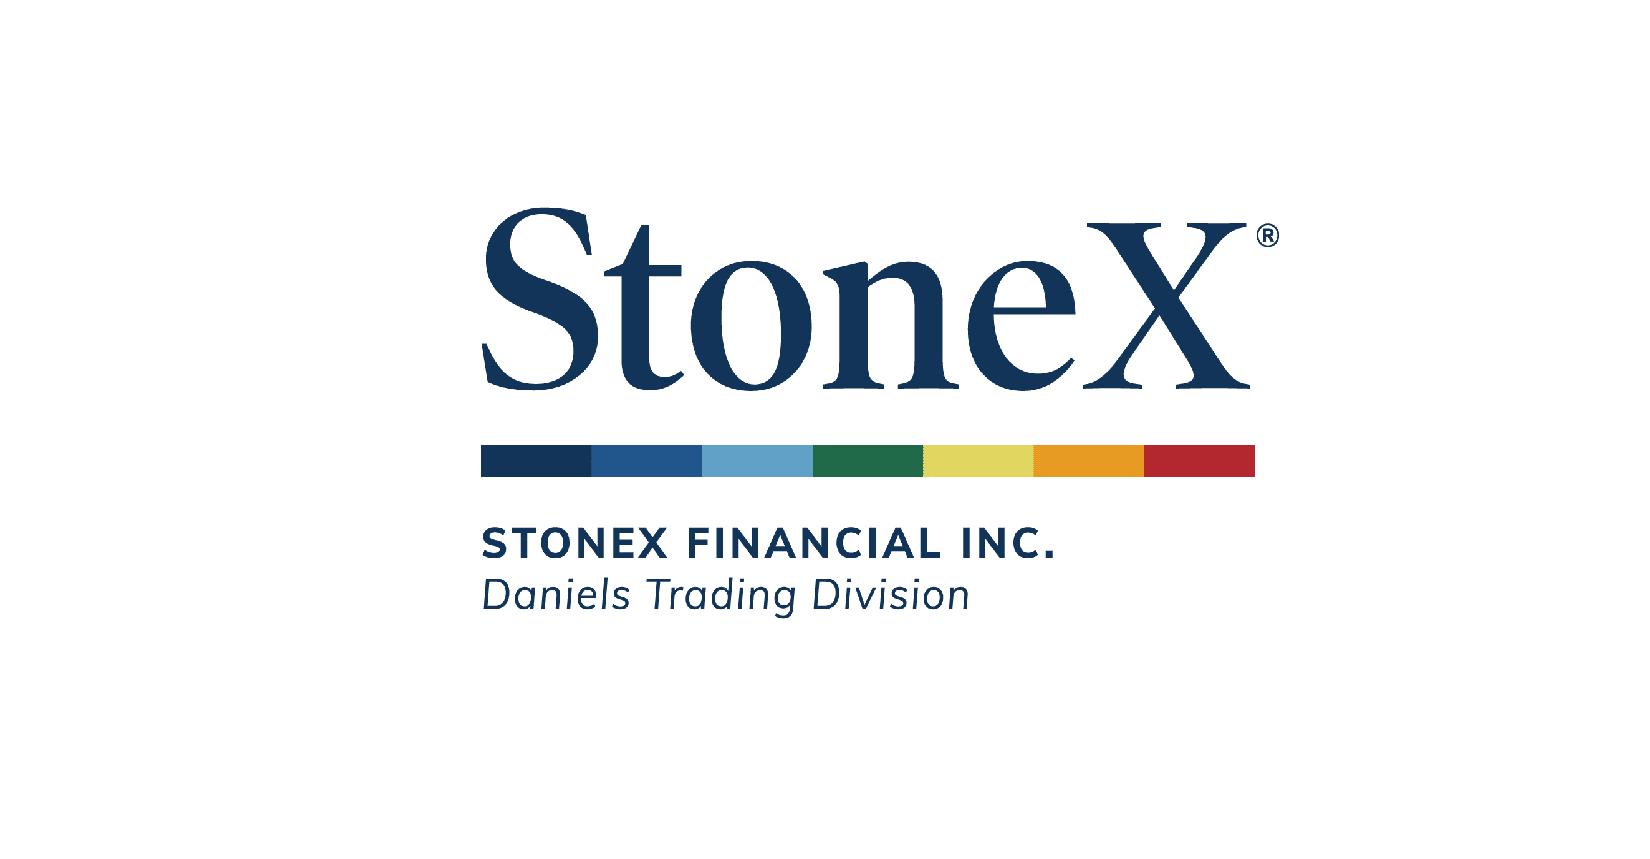 StoneX Financial Inc., Daniels Trading Division